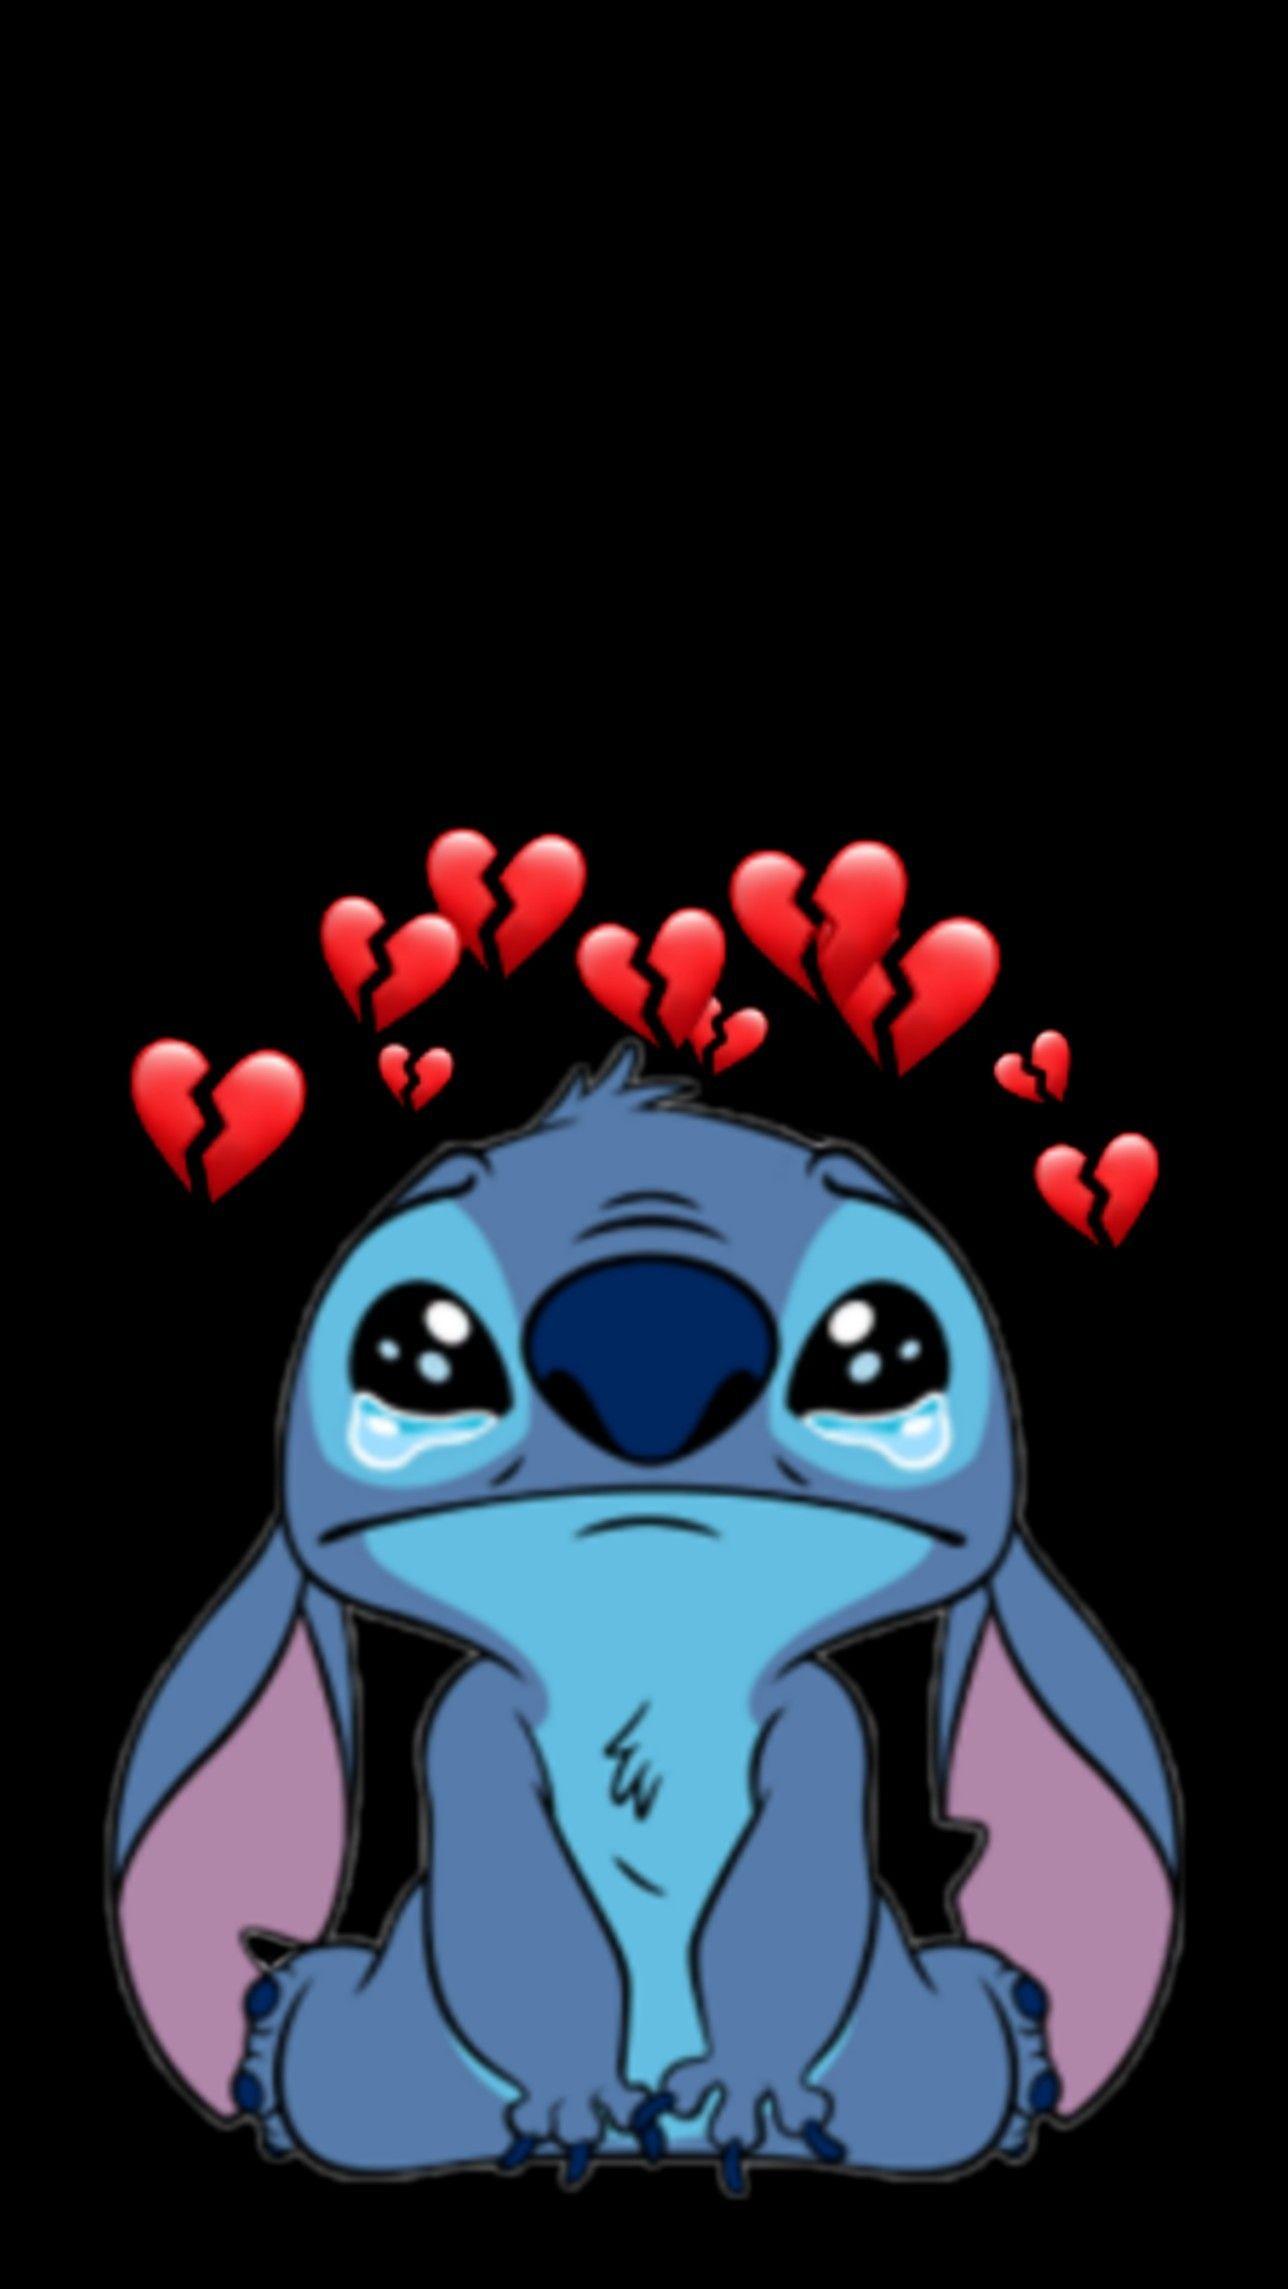 Fond D Ecran Stitch In 2020 Disney Wallpaper Cartoon Wallpaper Iphone Cute Disney Wallpaper